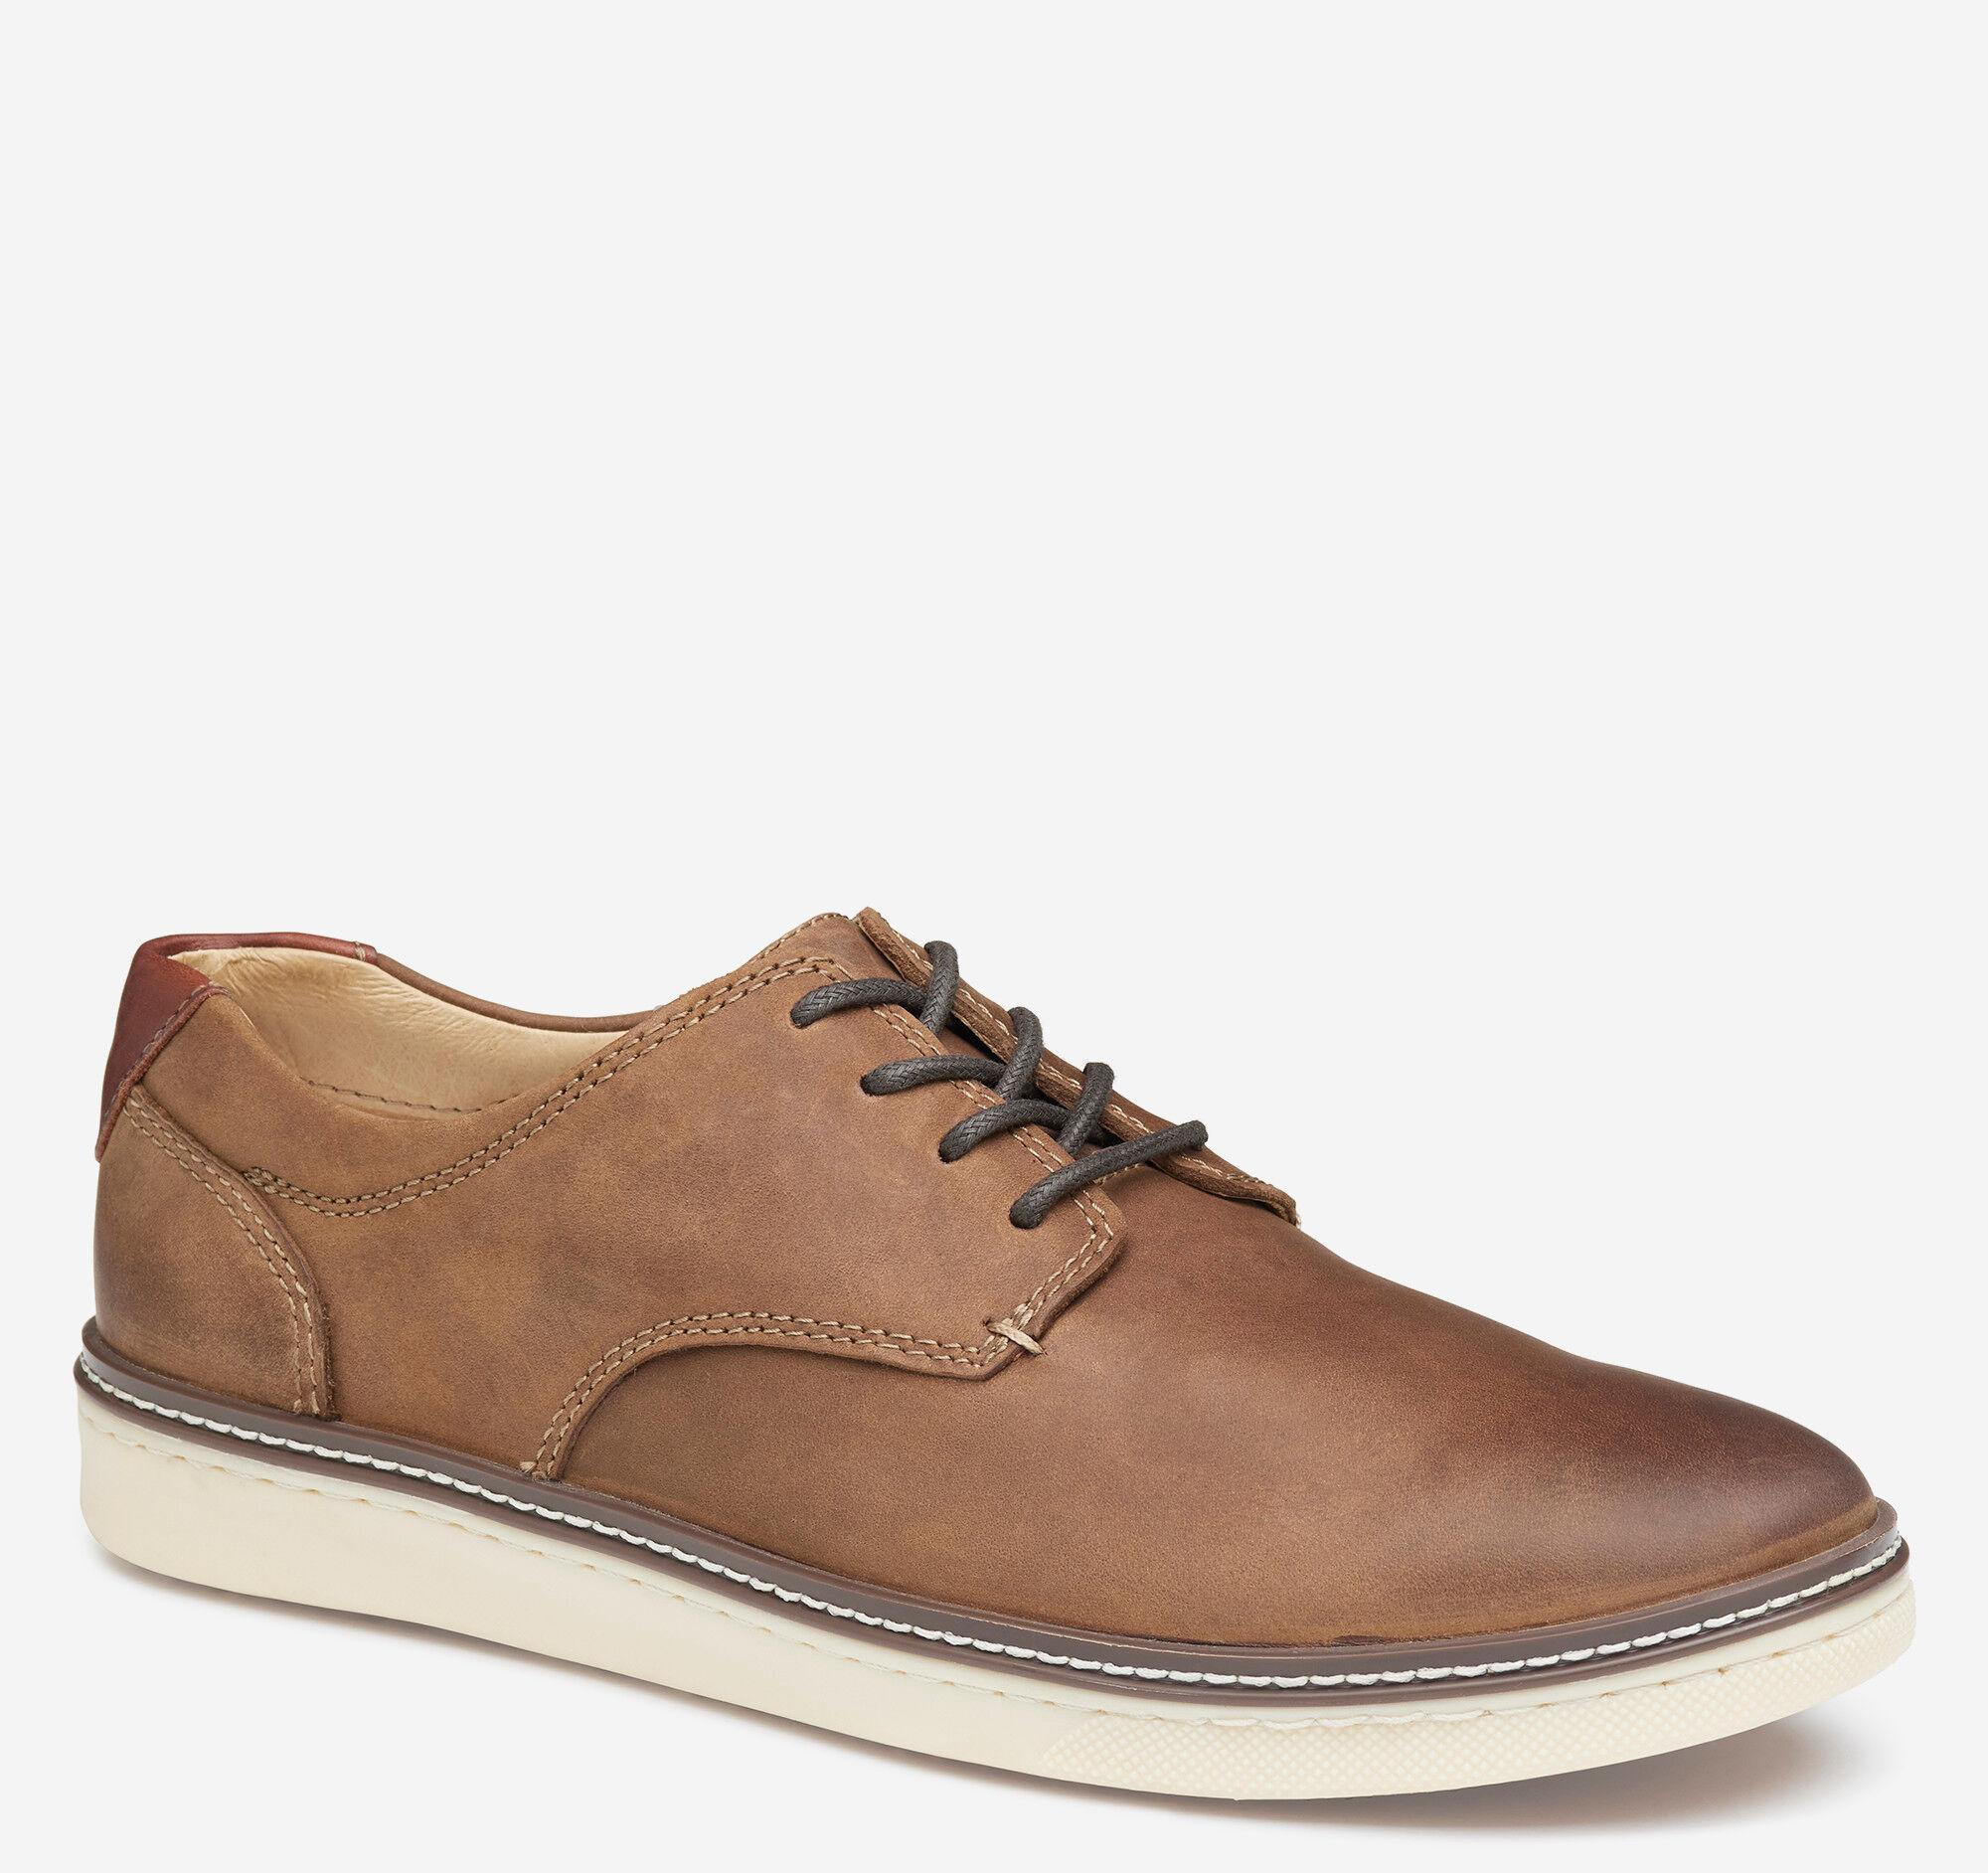 Johnston & Murphy Men's McGuffey Plain Toe Shoe - Tan Oiled Full Grain - Size 11.5 - M